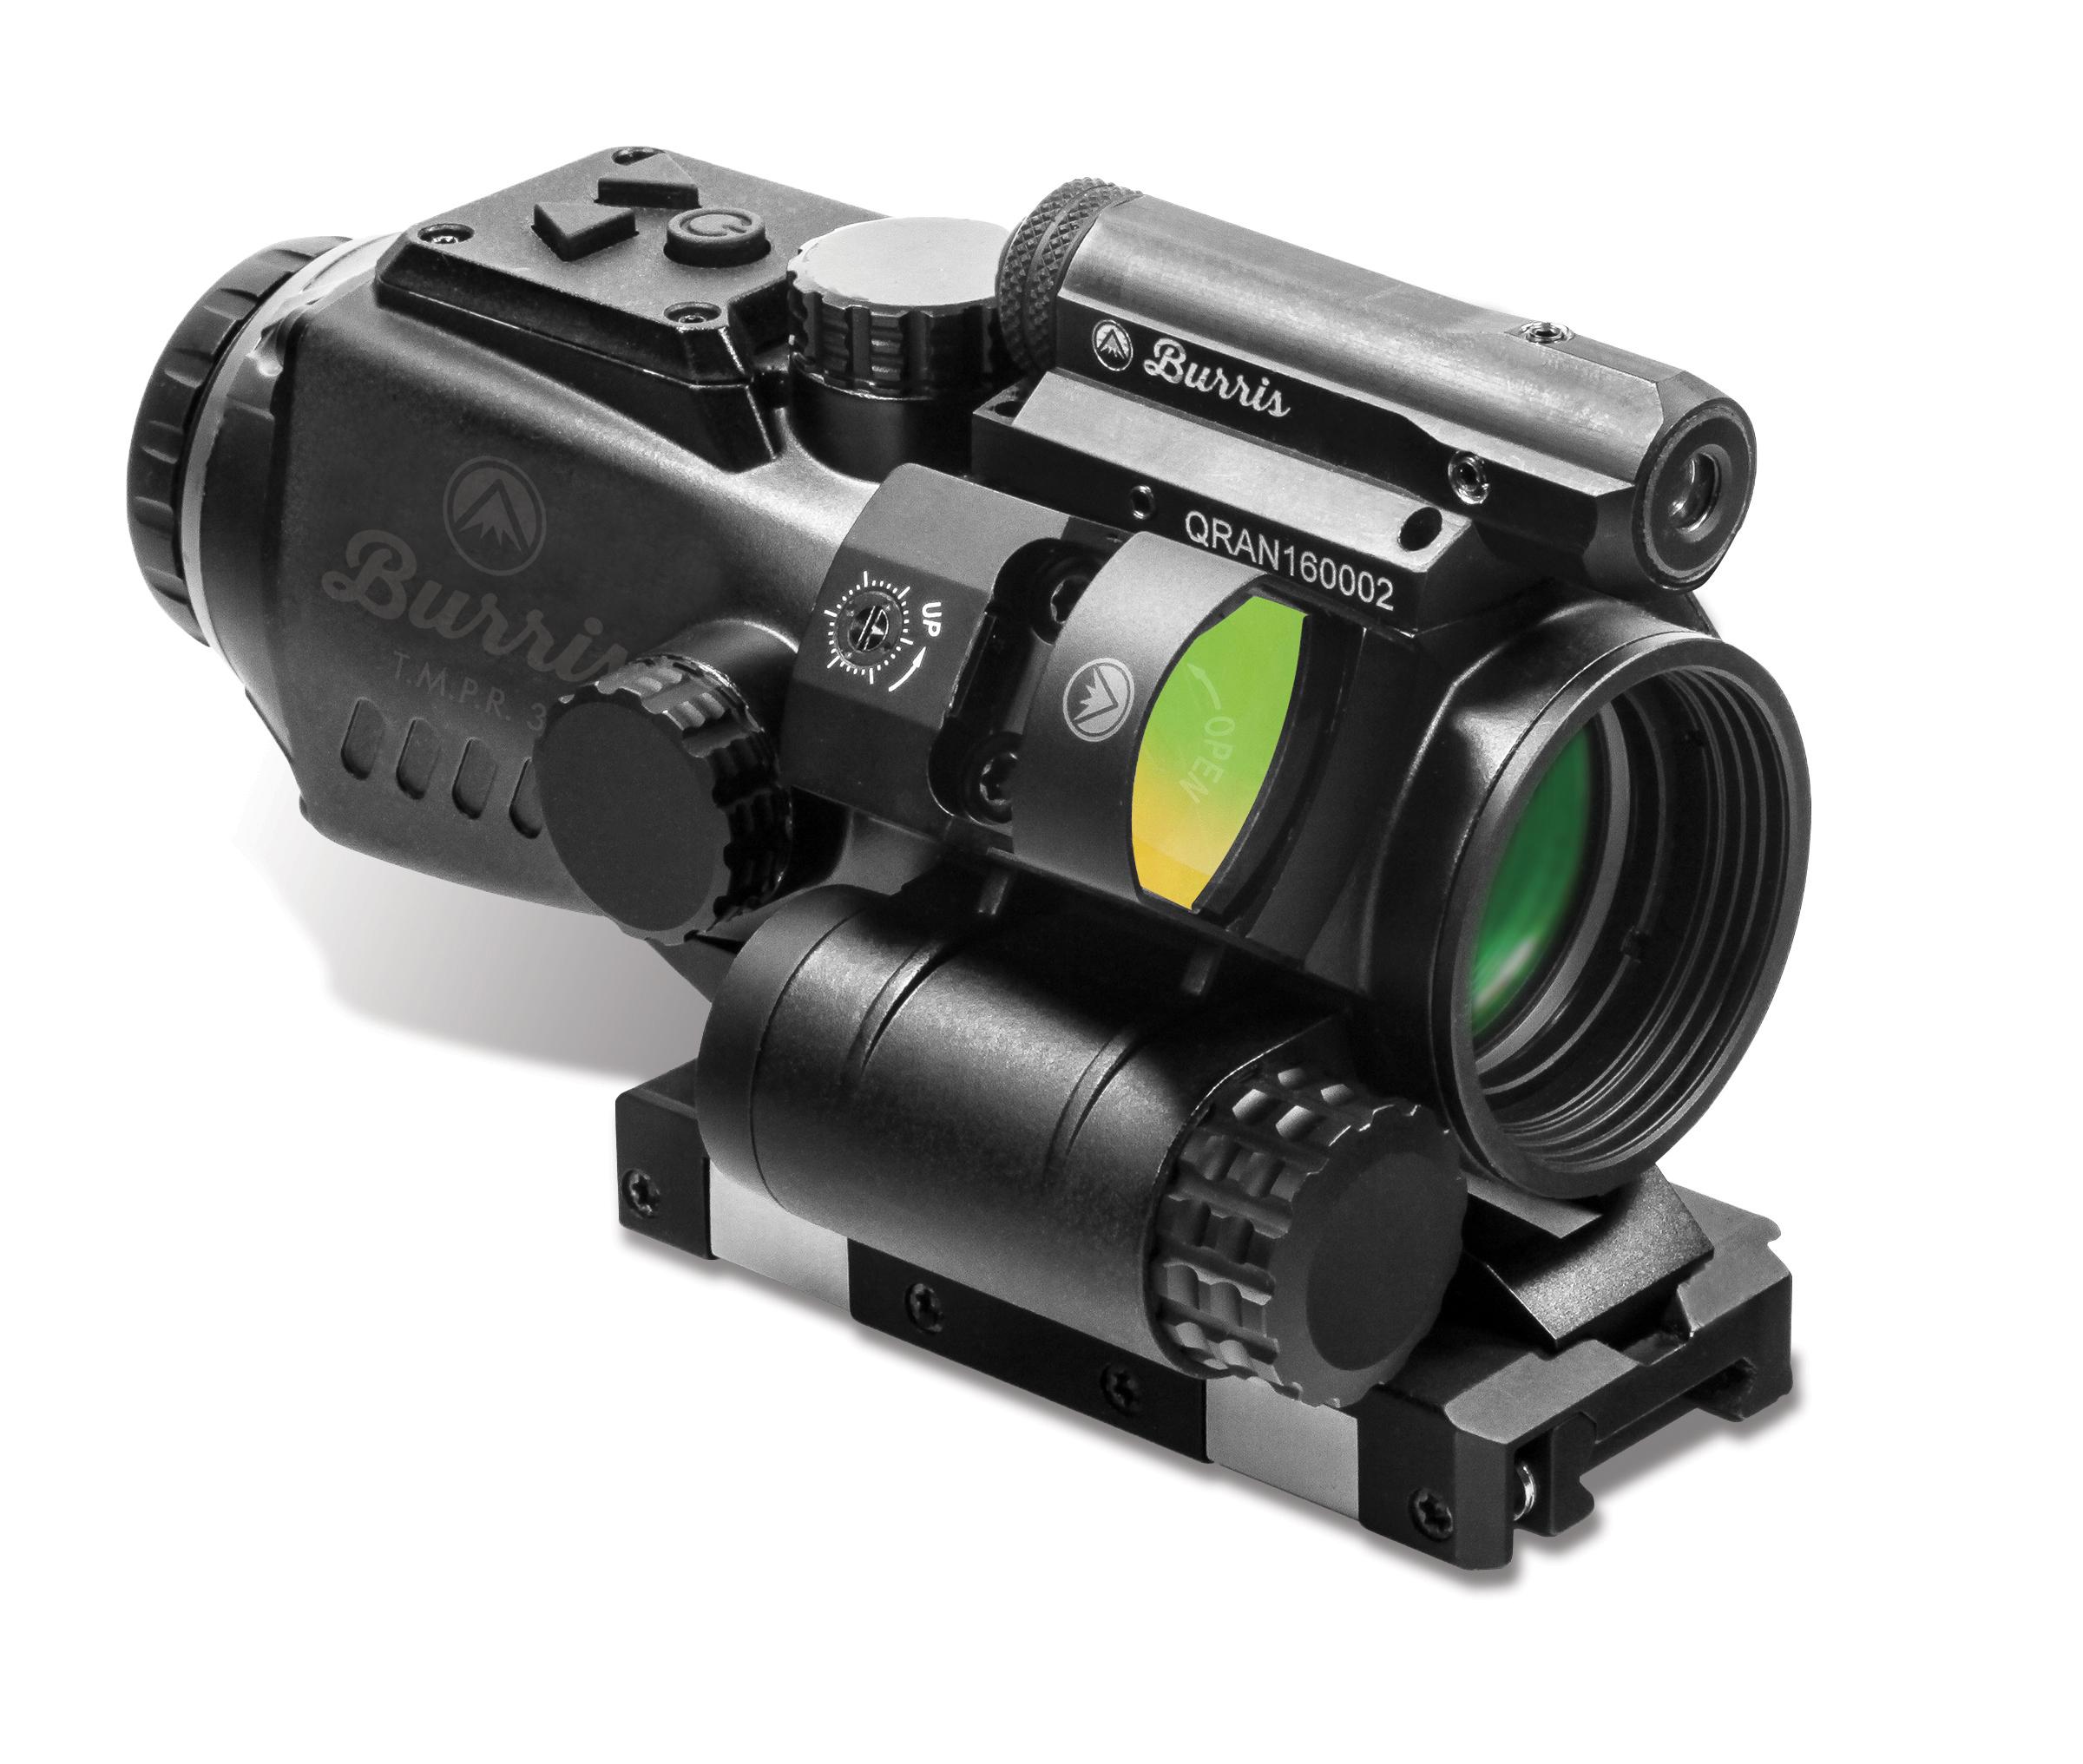 Burris Optics T-MOD 332